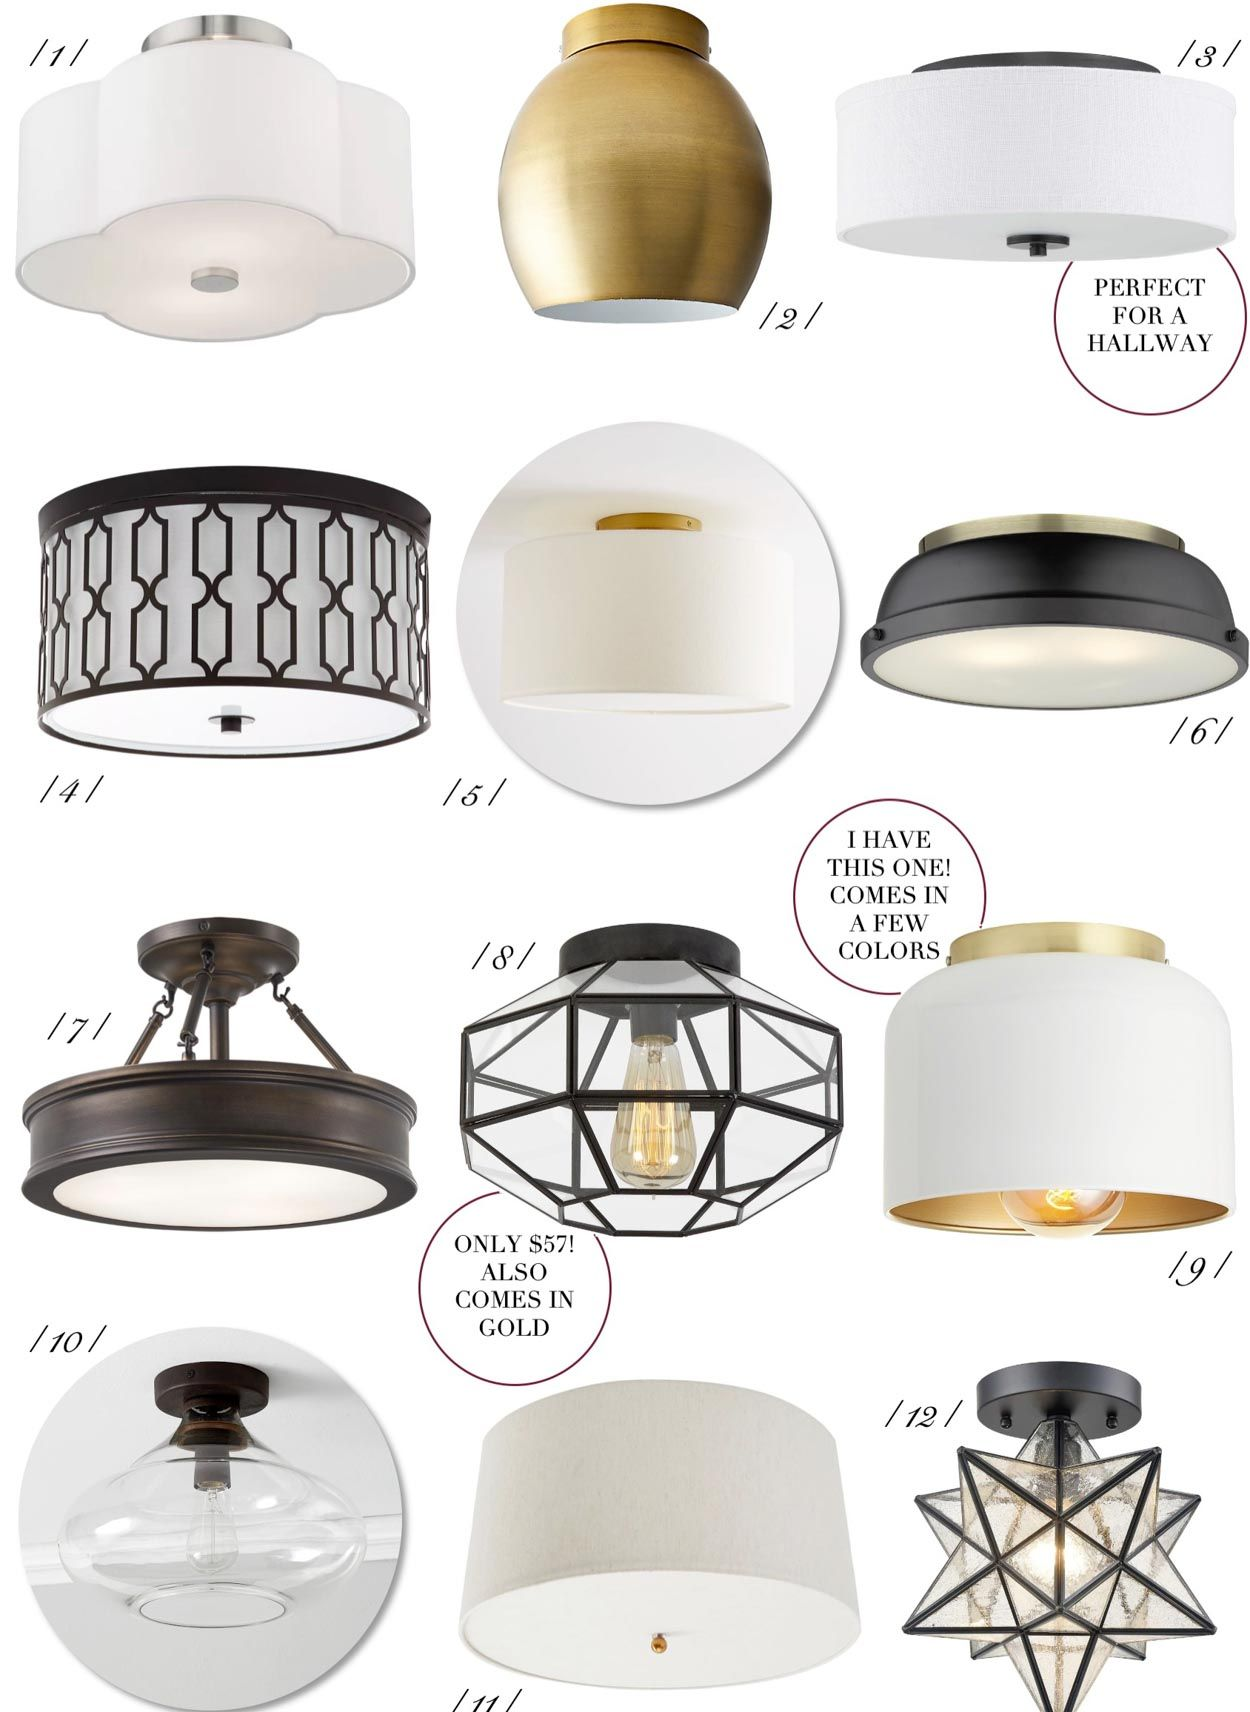 The 20 Best Flush Mount Lights Under 100 Flush Mount Lights